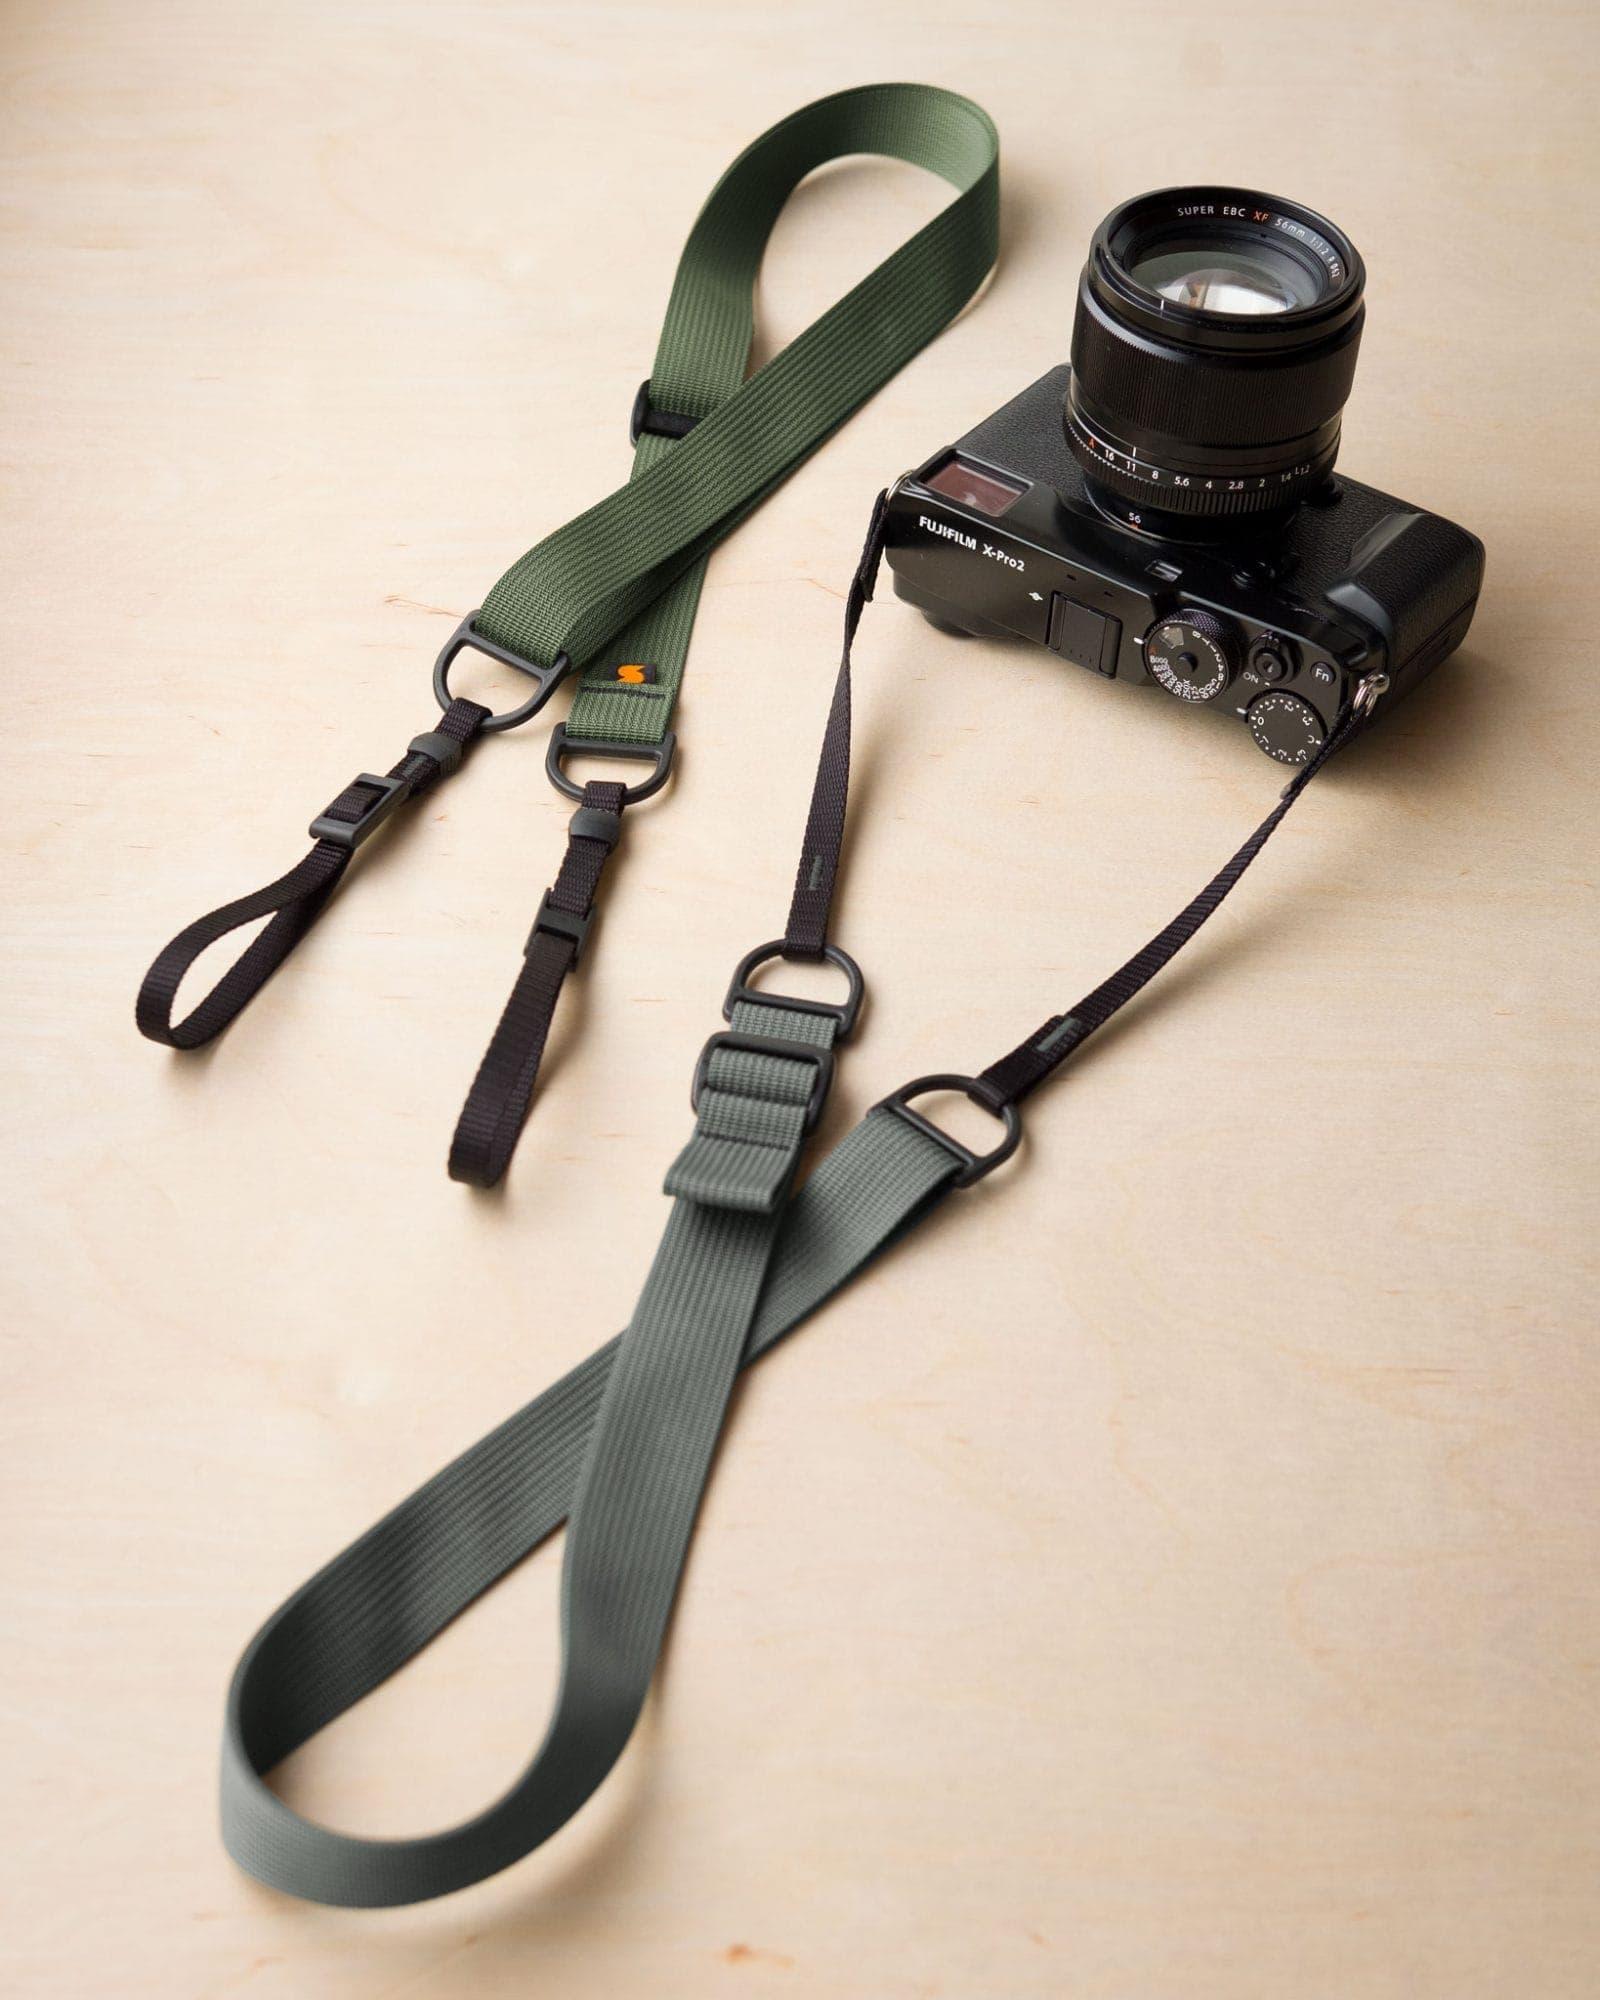 Simplr F1 Sling Style Camera Straps